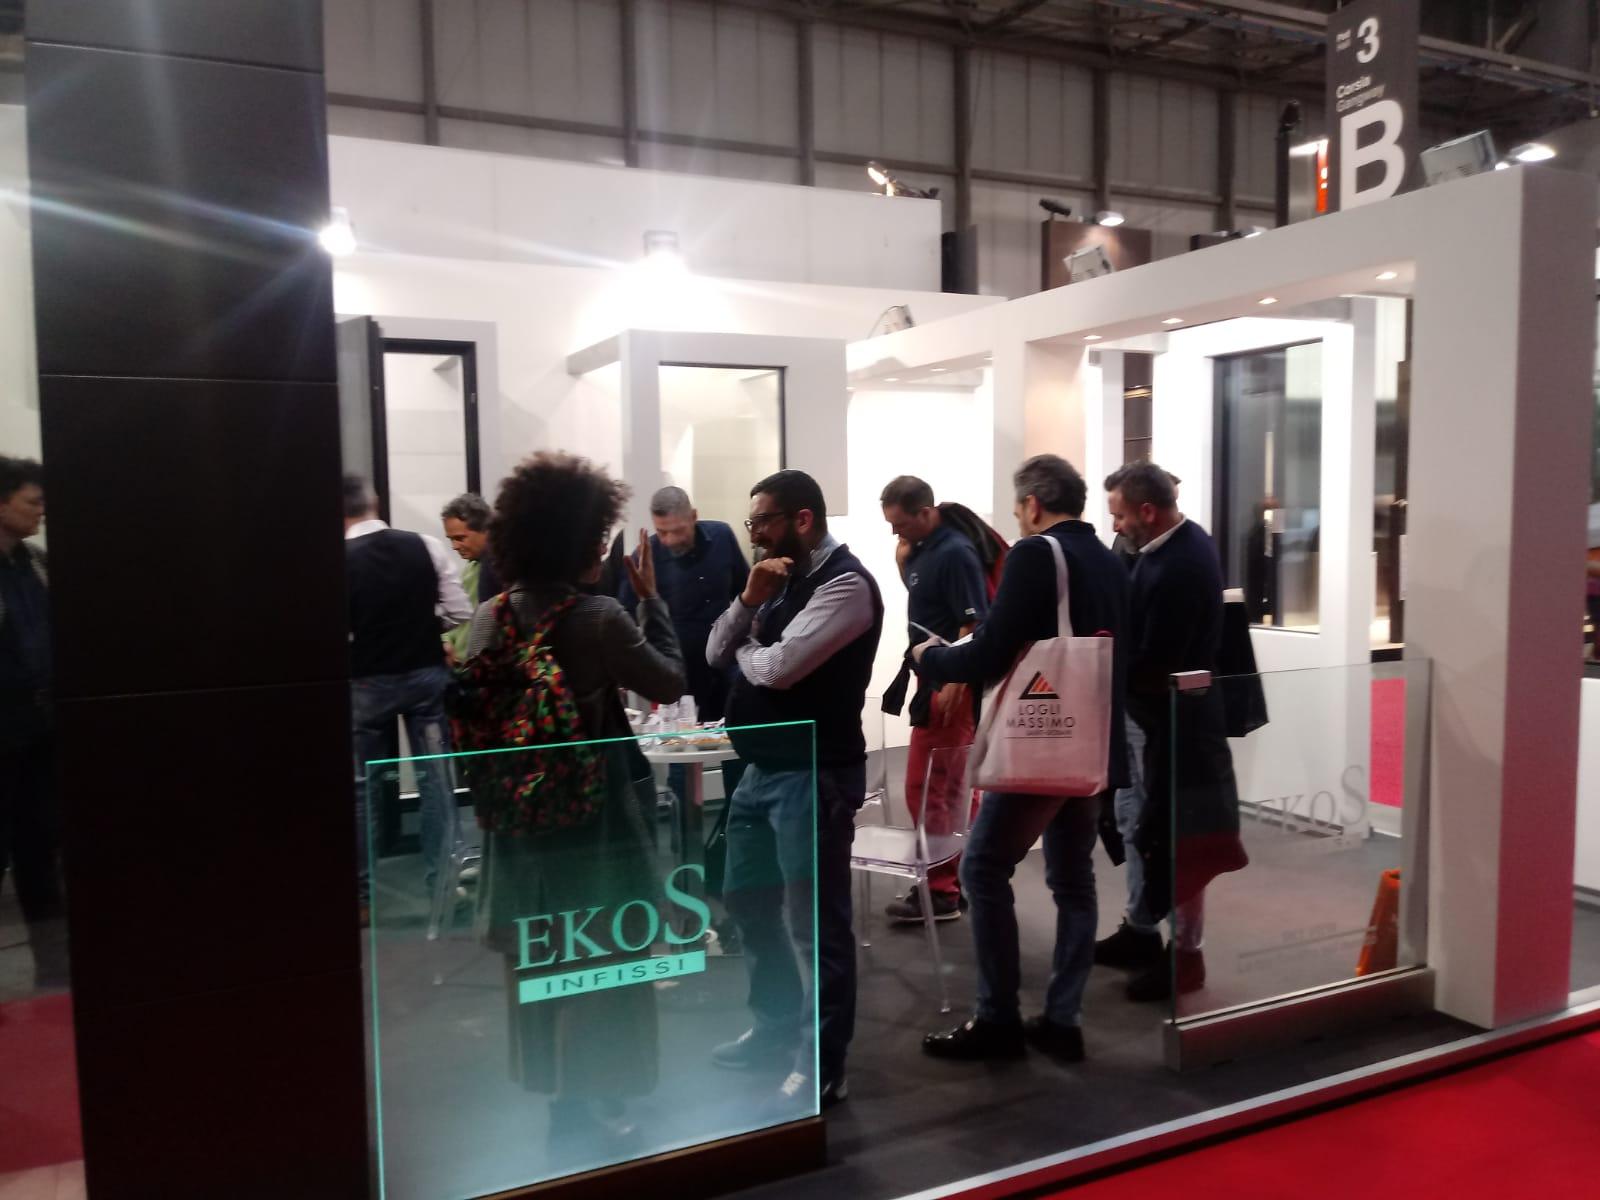 EkoS Infissi al MADE Expo Fiera di Milano: news 19/03